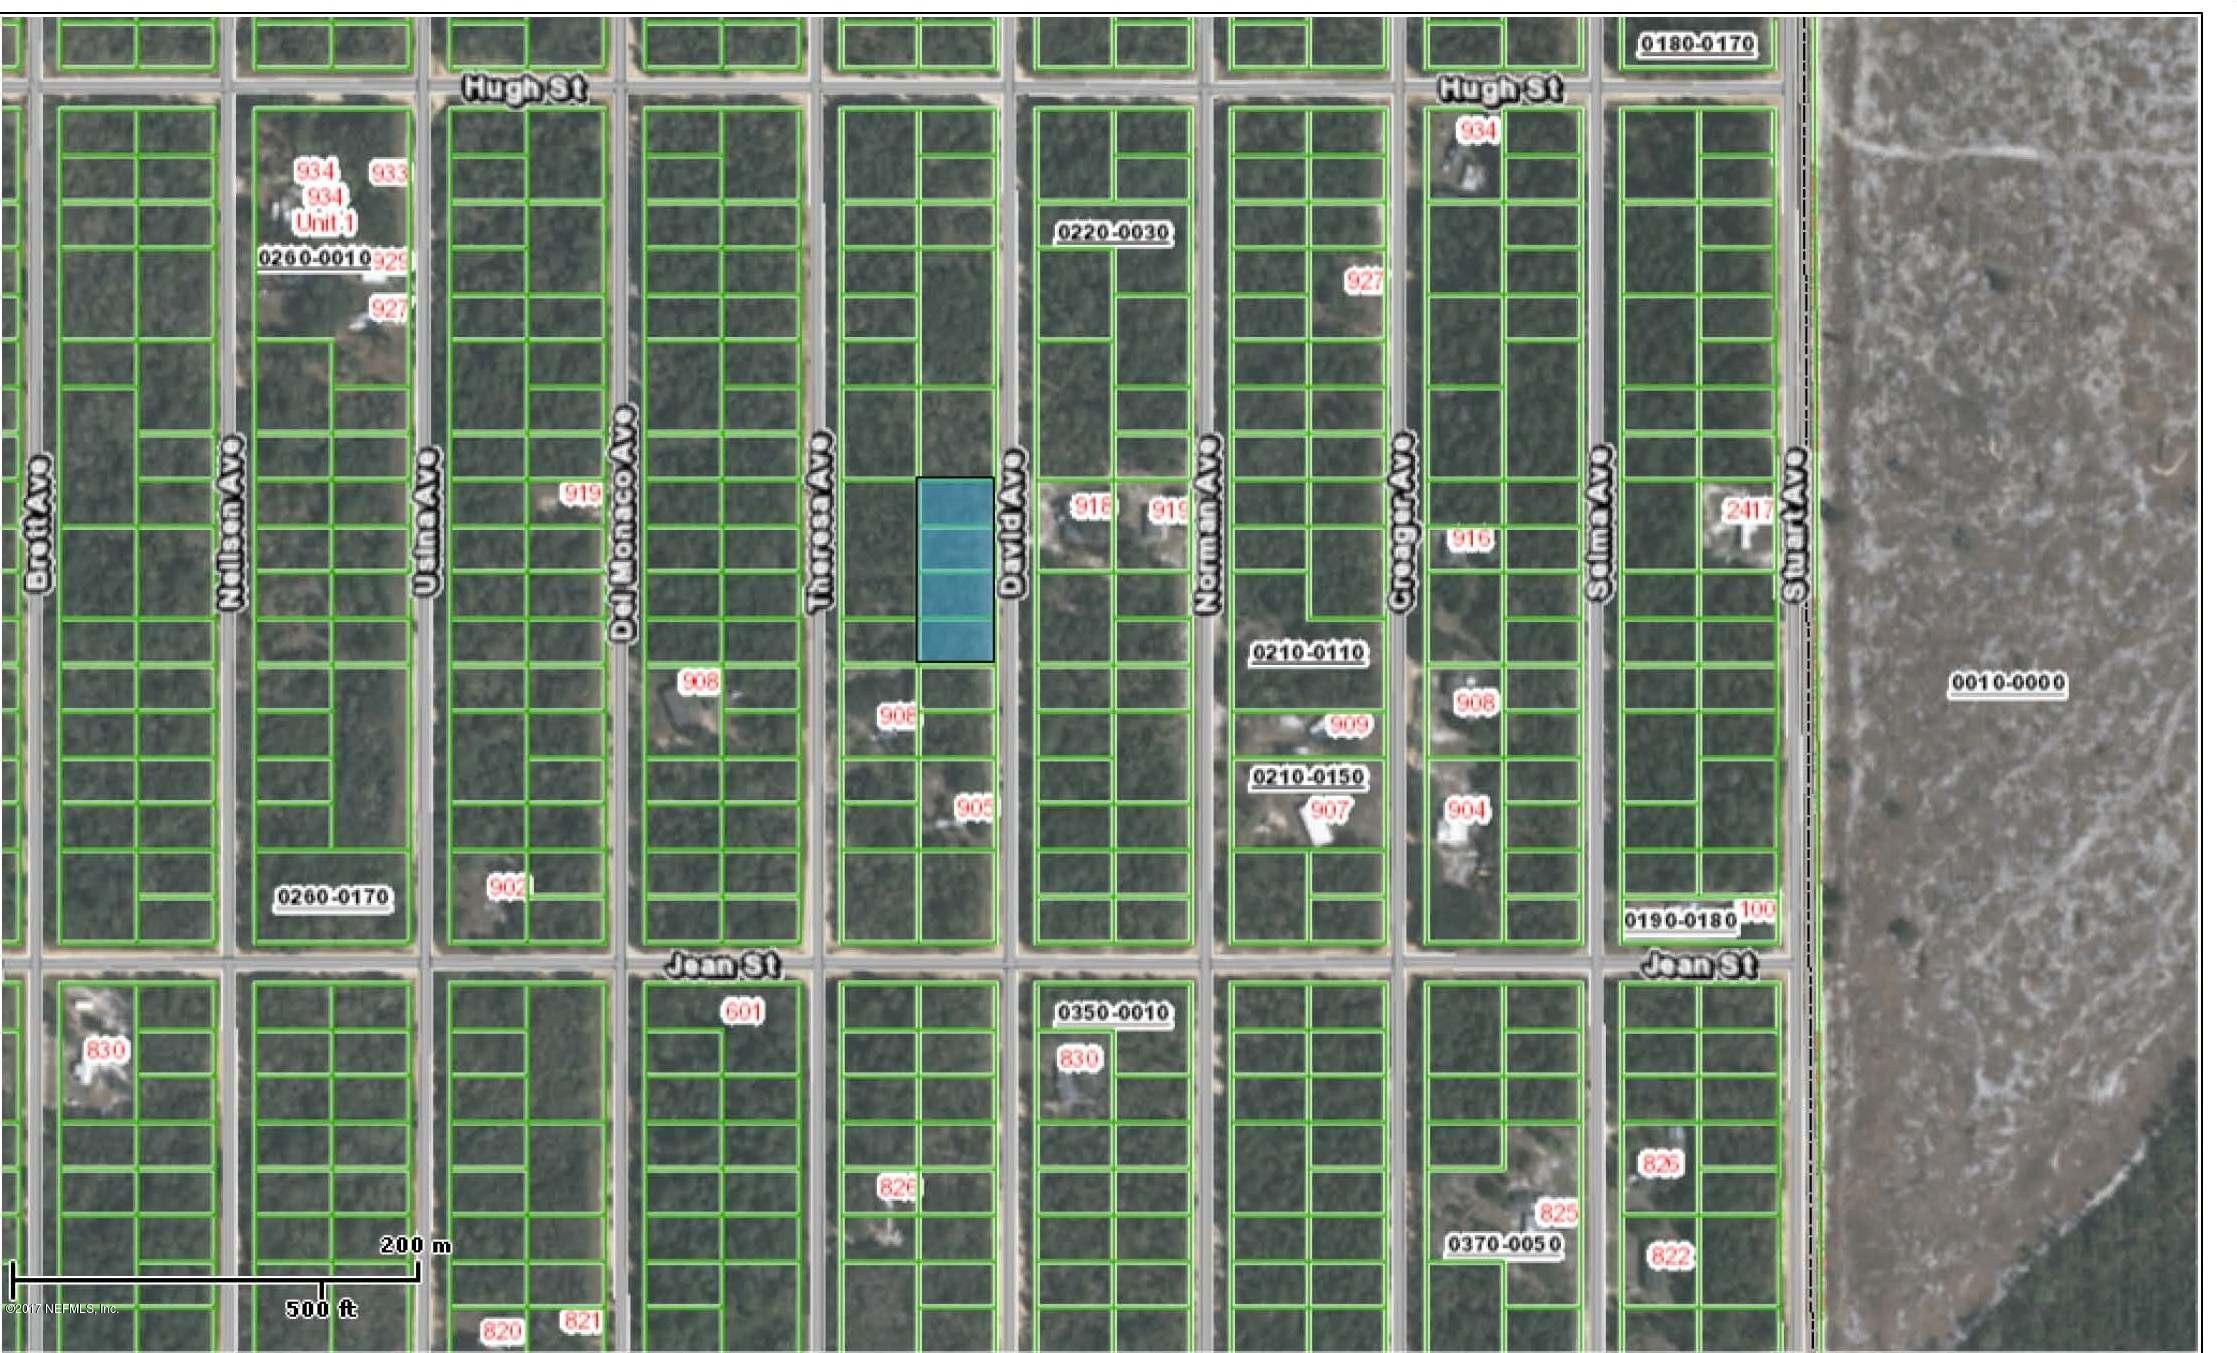 915 DAVID, INTERLACHEN, FLORIDA 32148, ,Vacant land,For sale,DAVID,894682